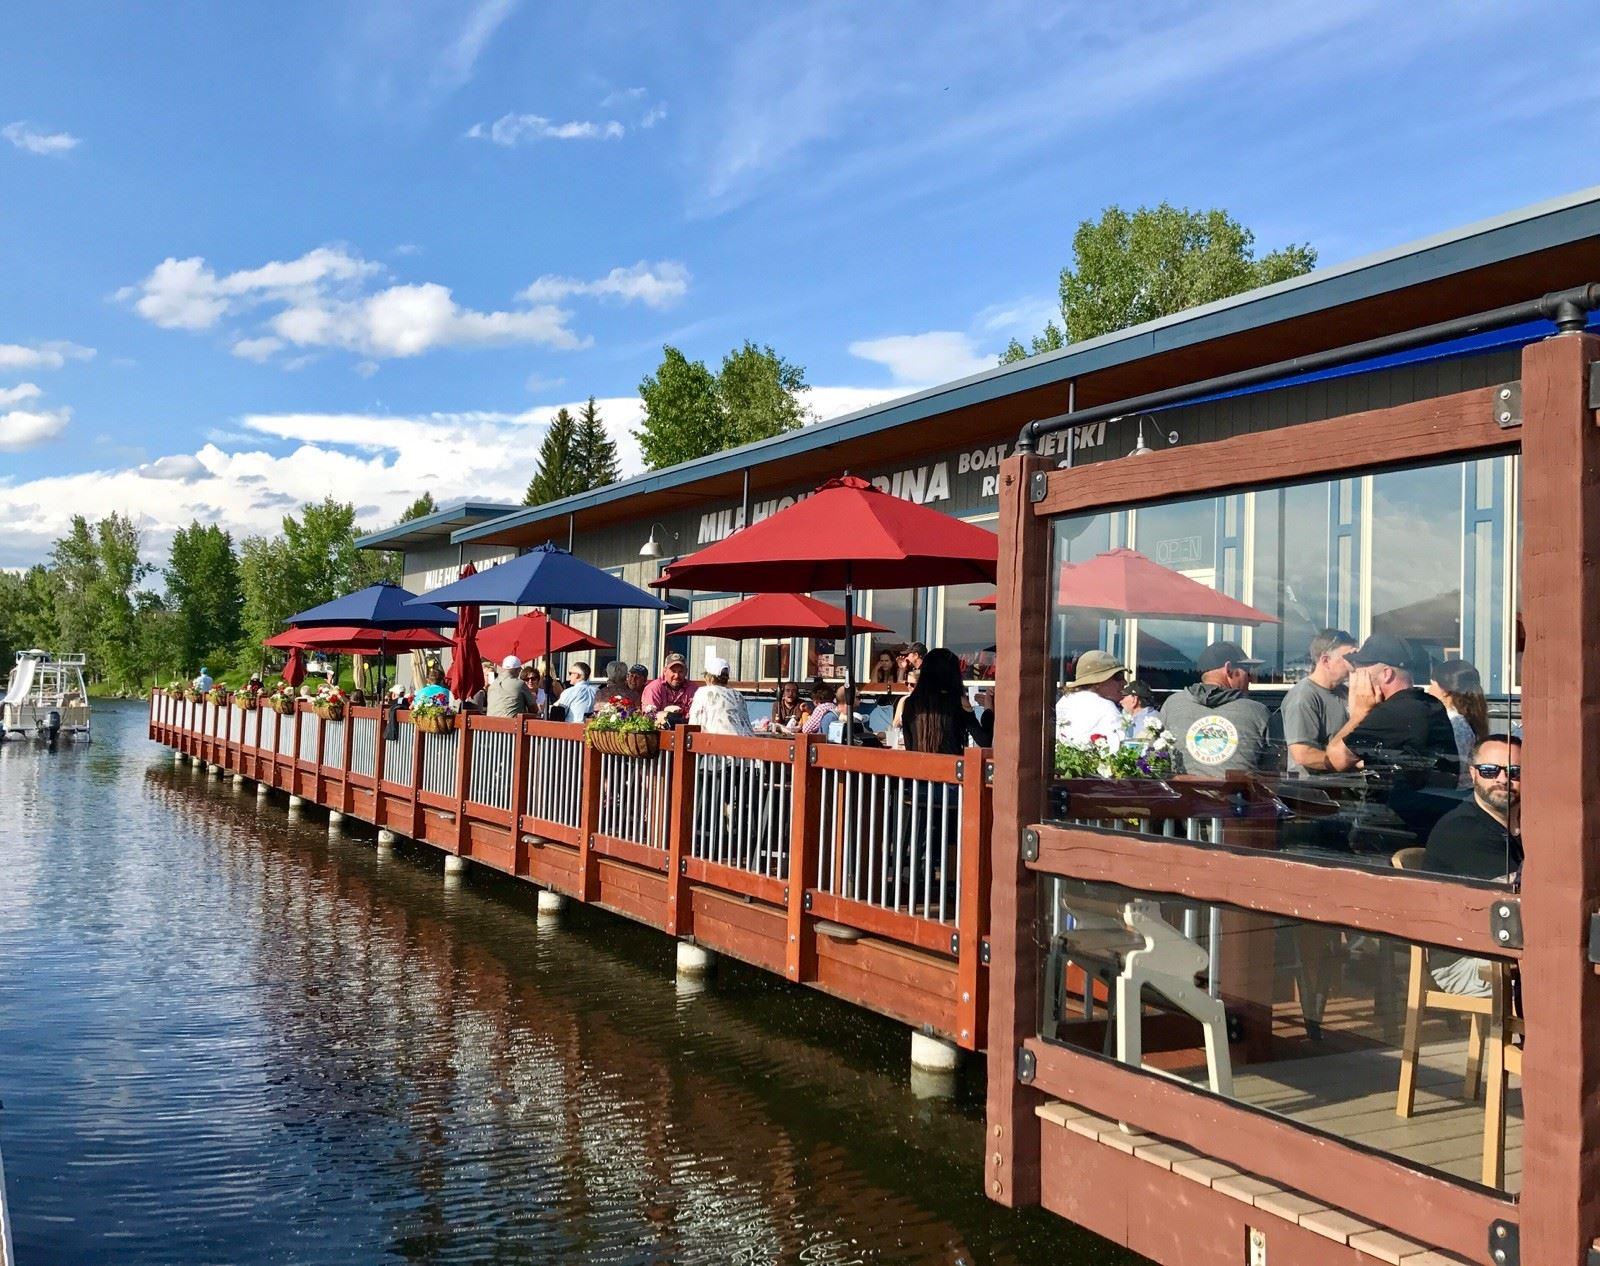 Grab Some Food And Rent A Kayak At Mile High Marina In Idaho